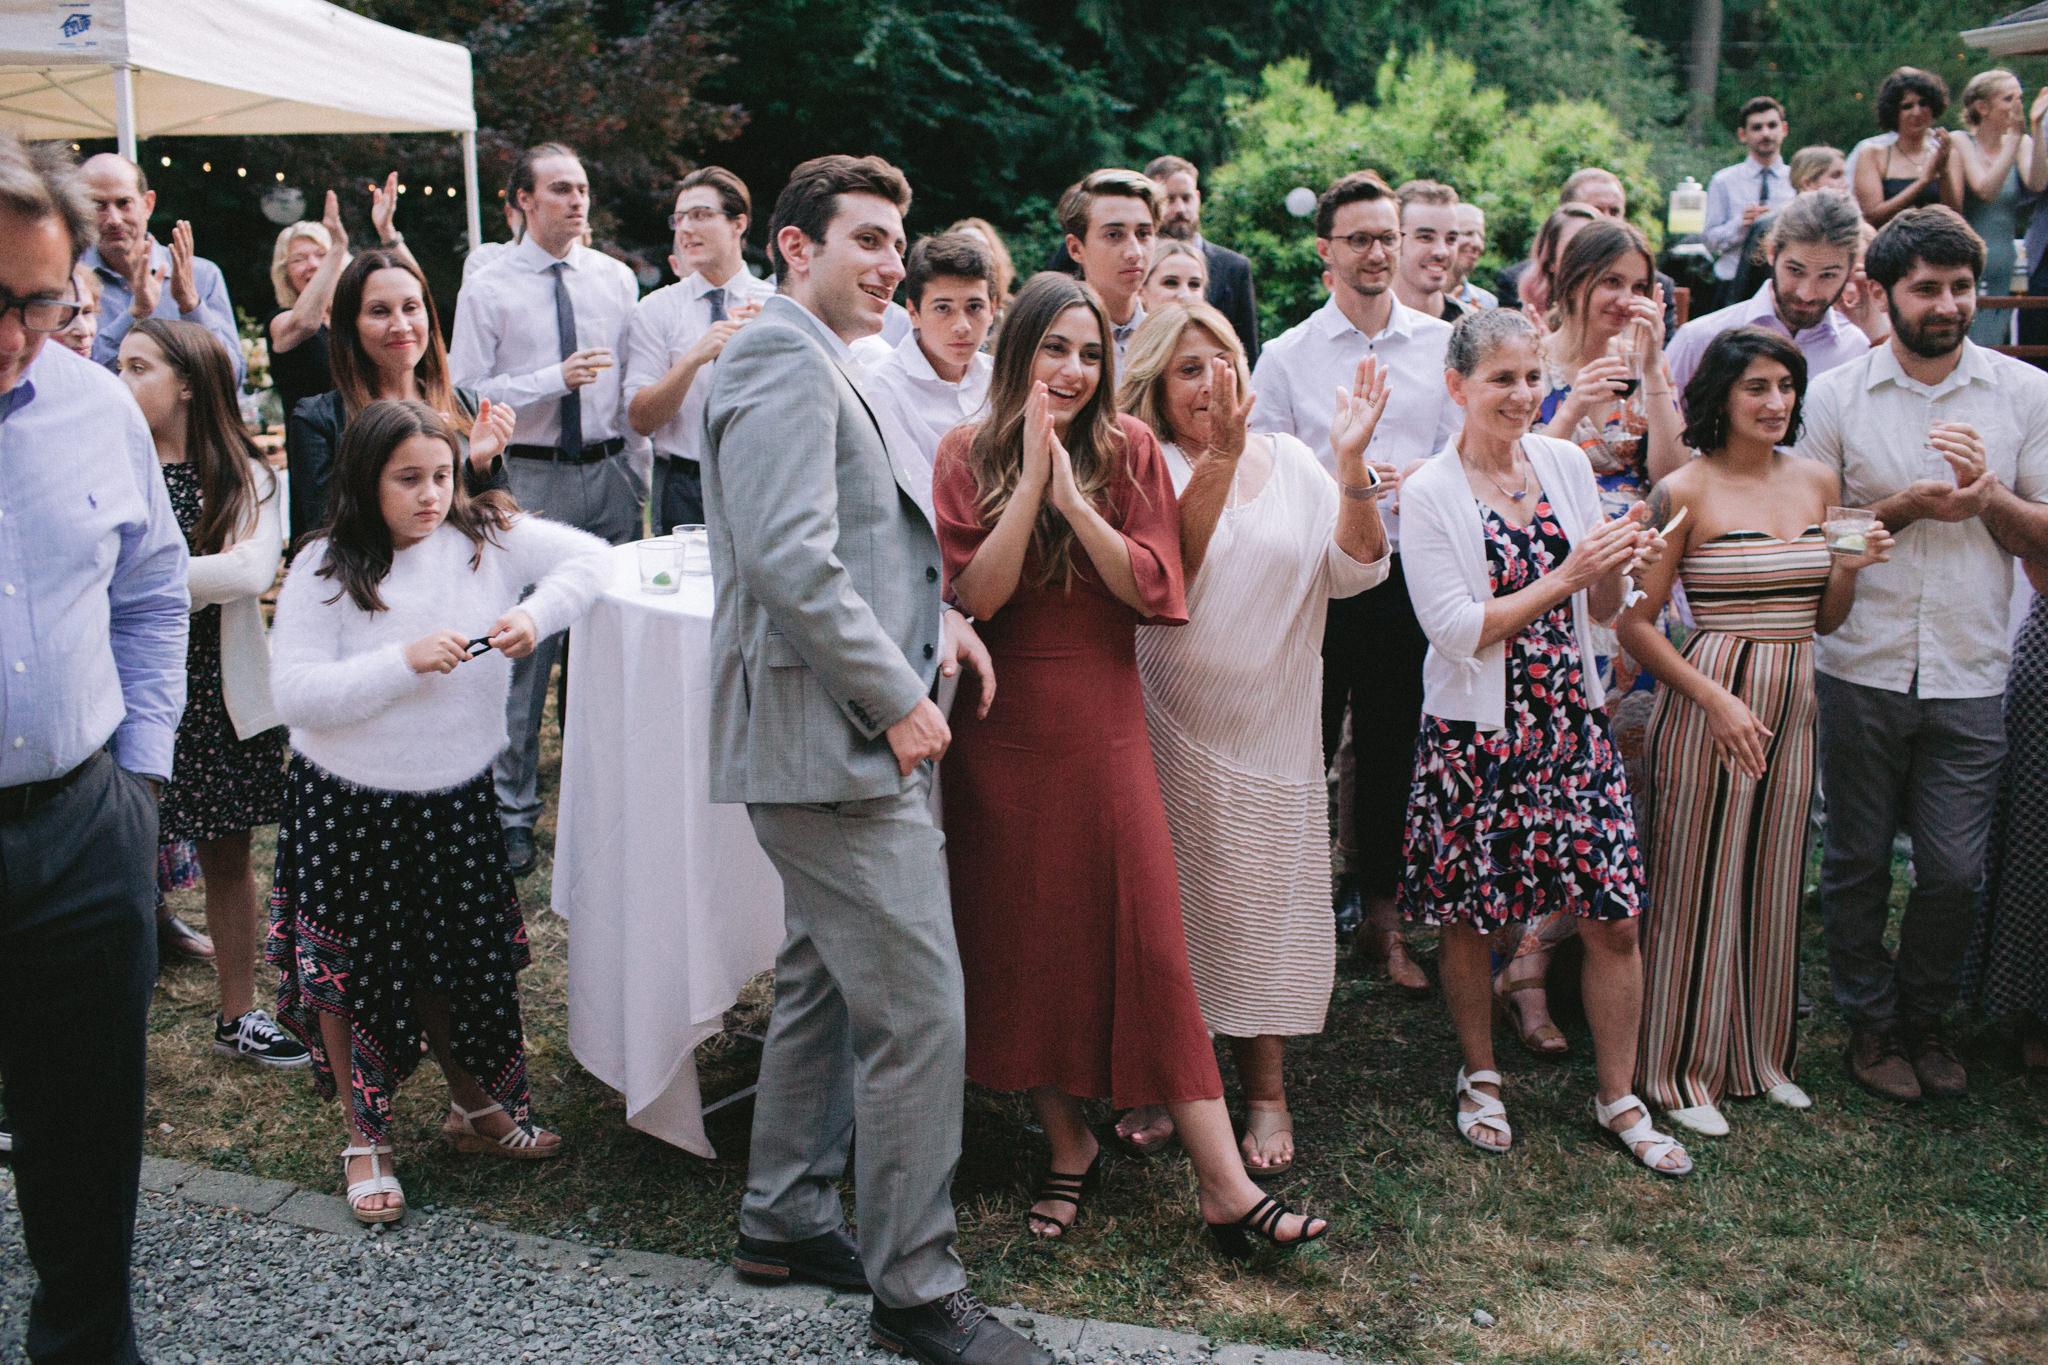 Backyard-Bainbridge-Island-Wedding-Alycia-Lovell-Photography-210.JPG